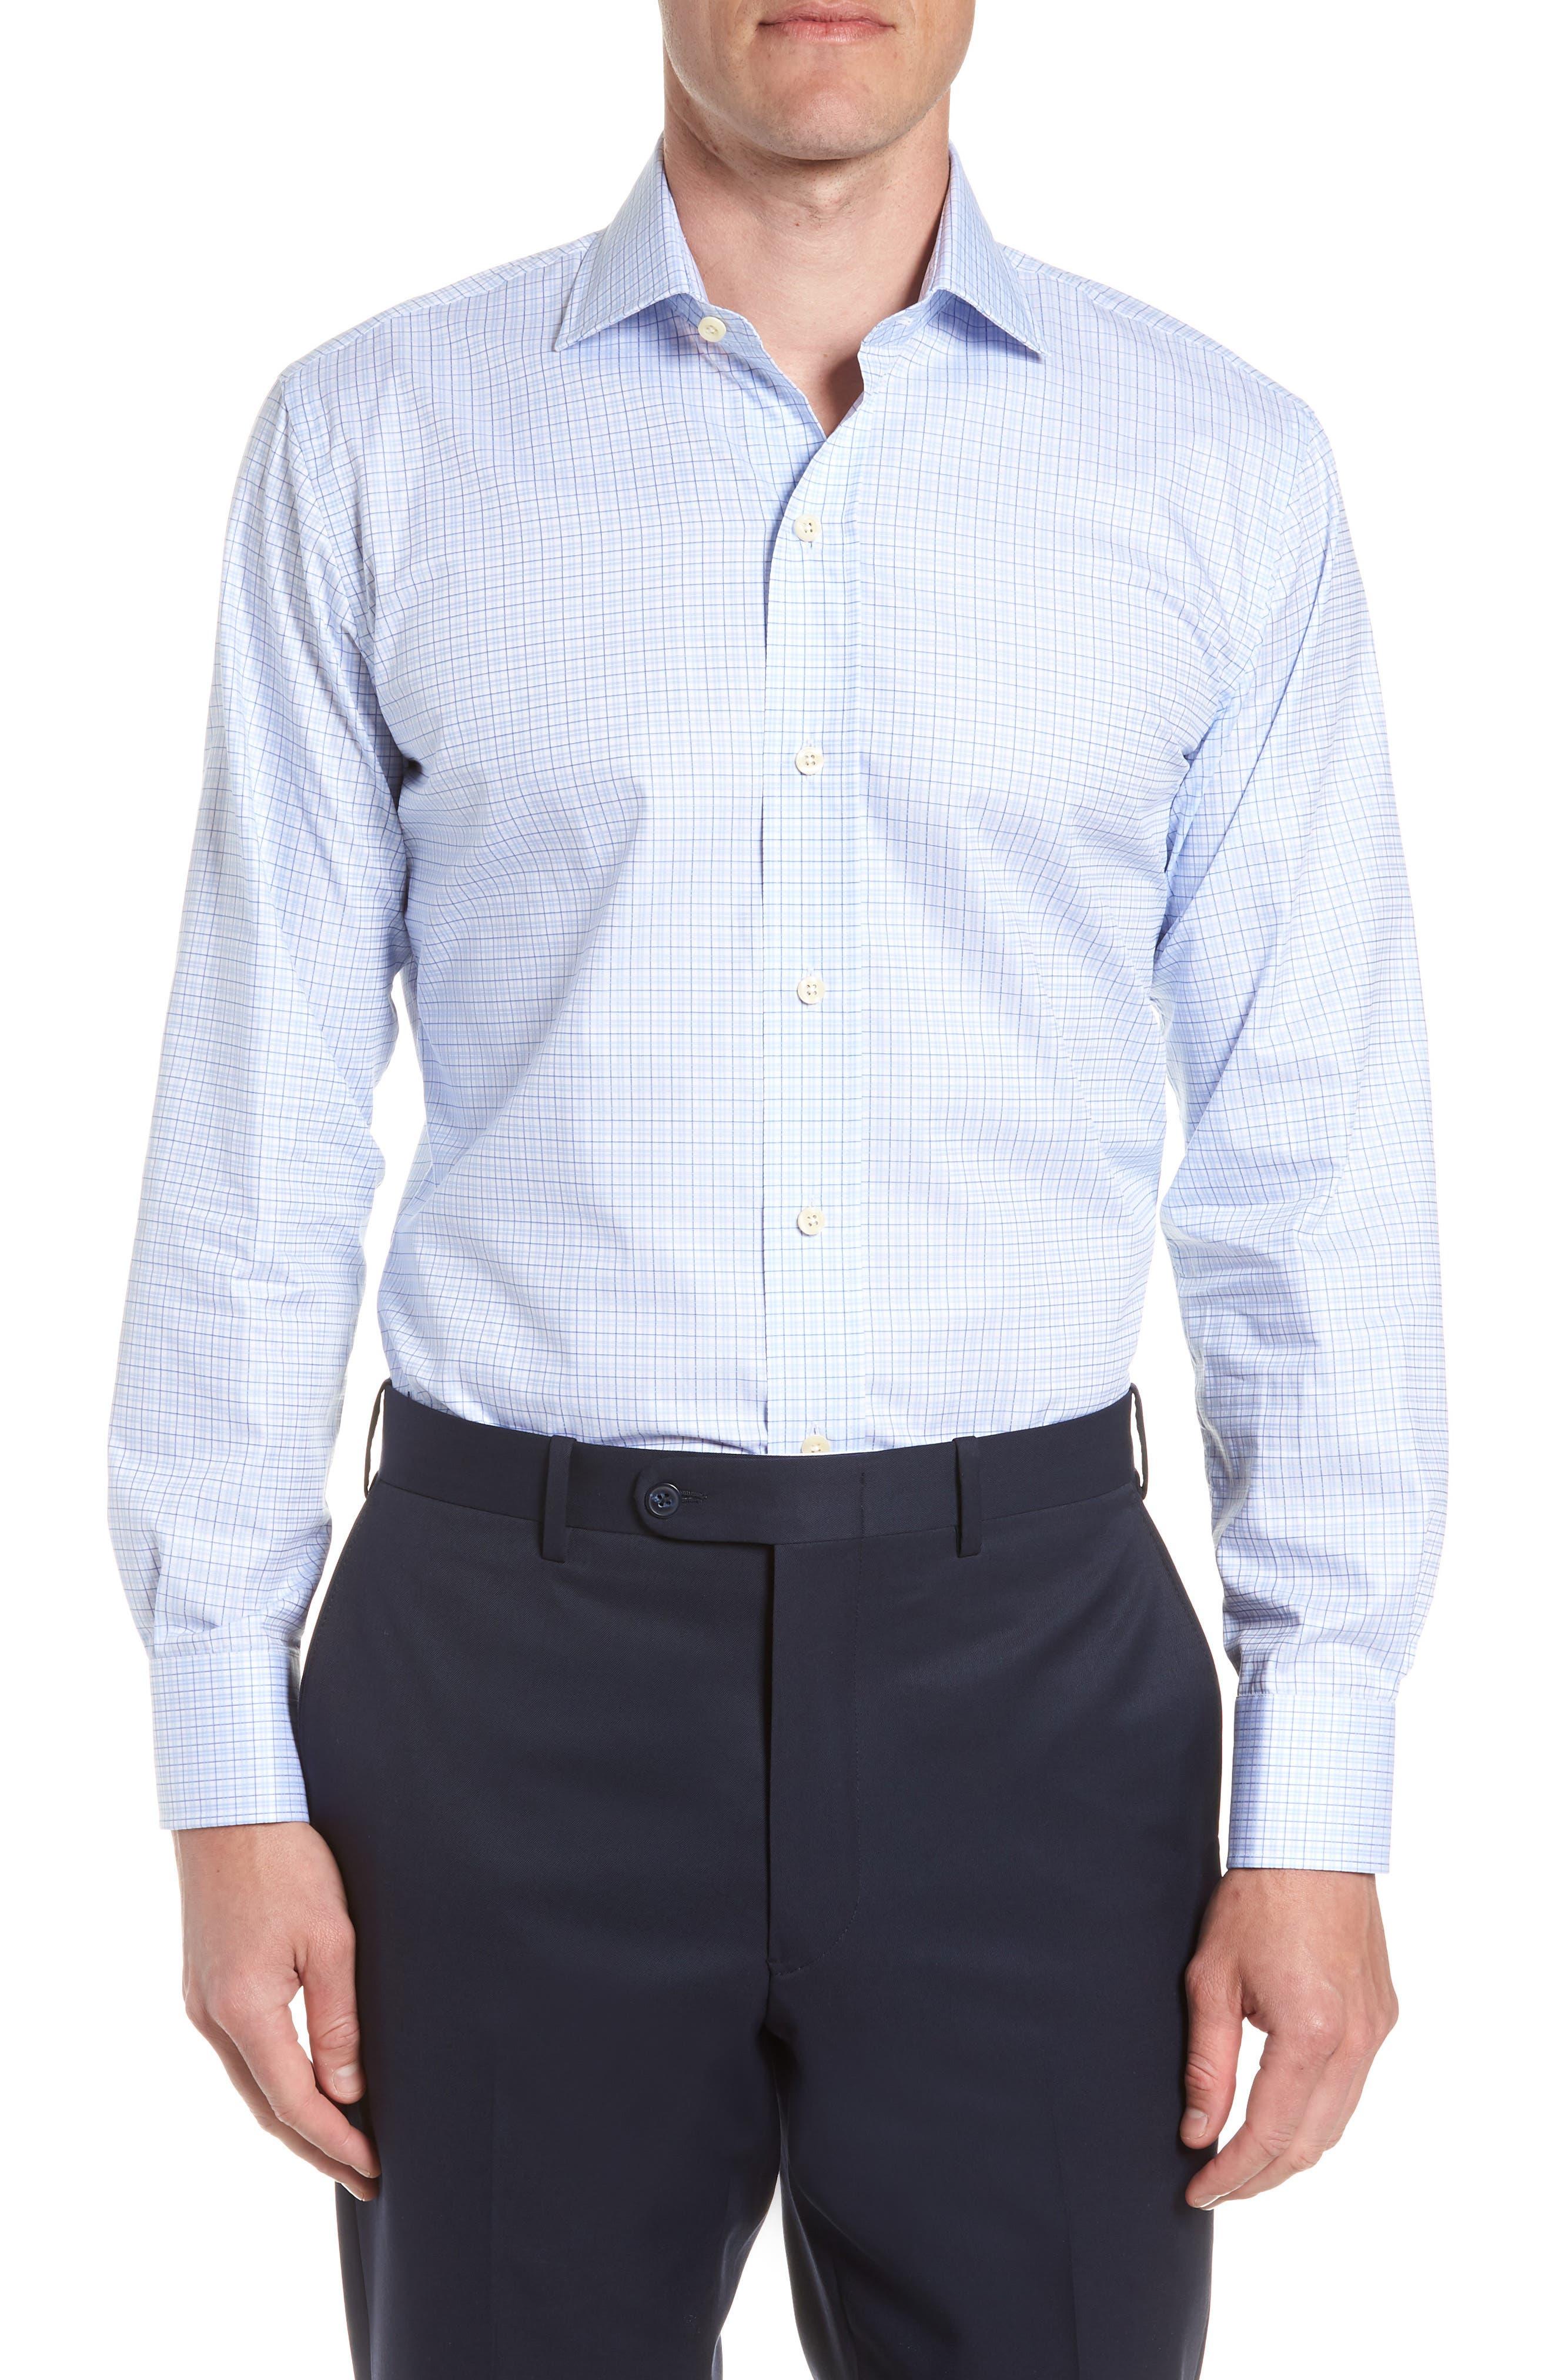 Moorland Trim Fit Check Dress Shirt,                             Main thumbnail 1, color,                             Blue